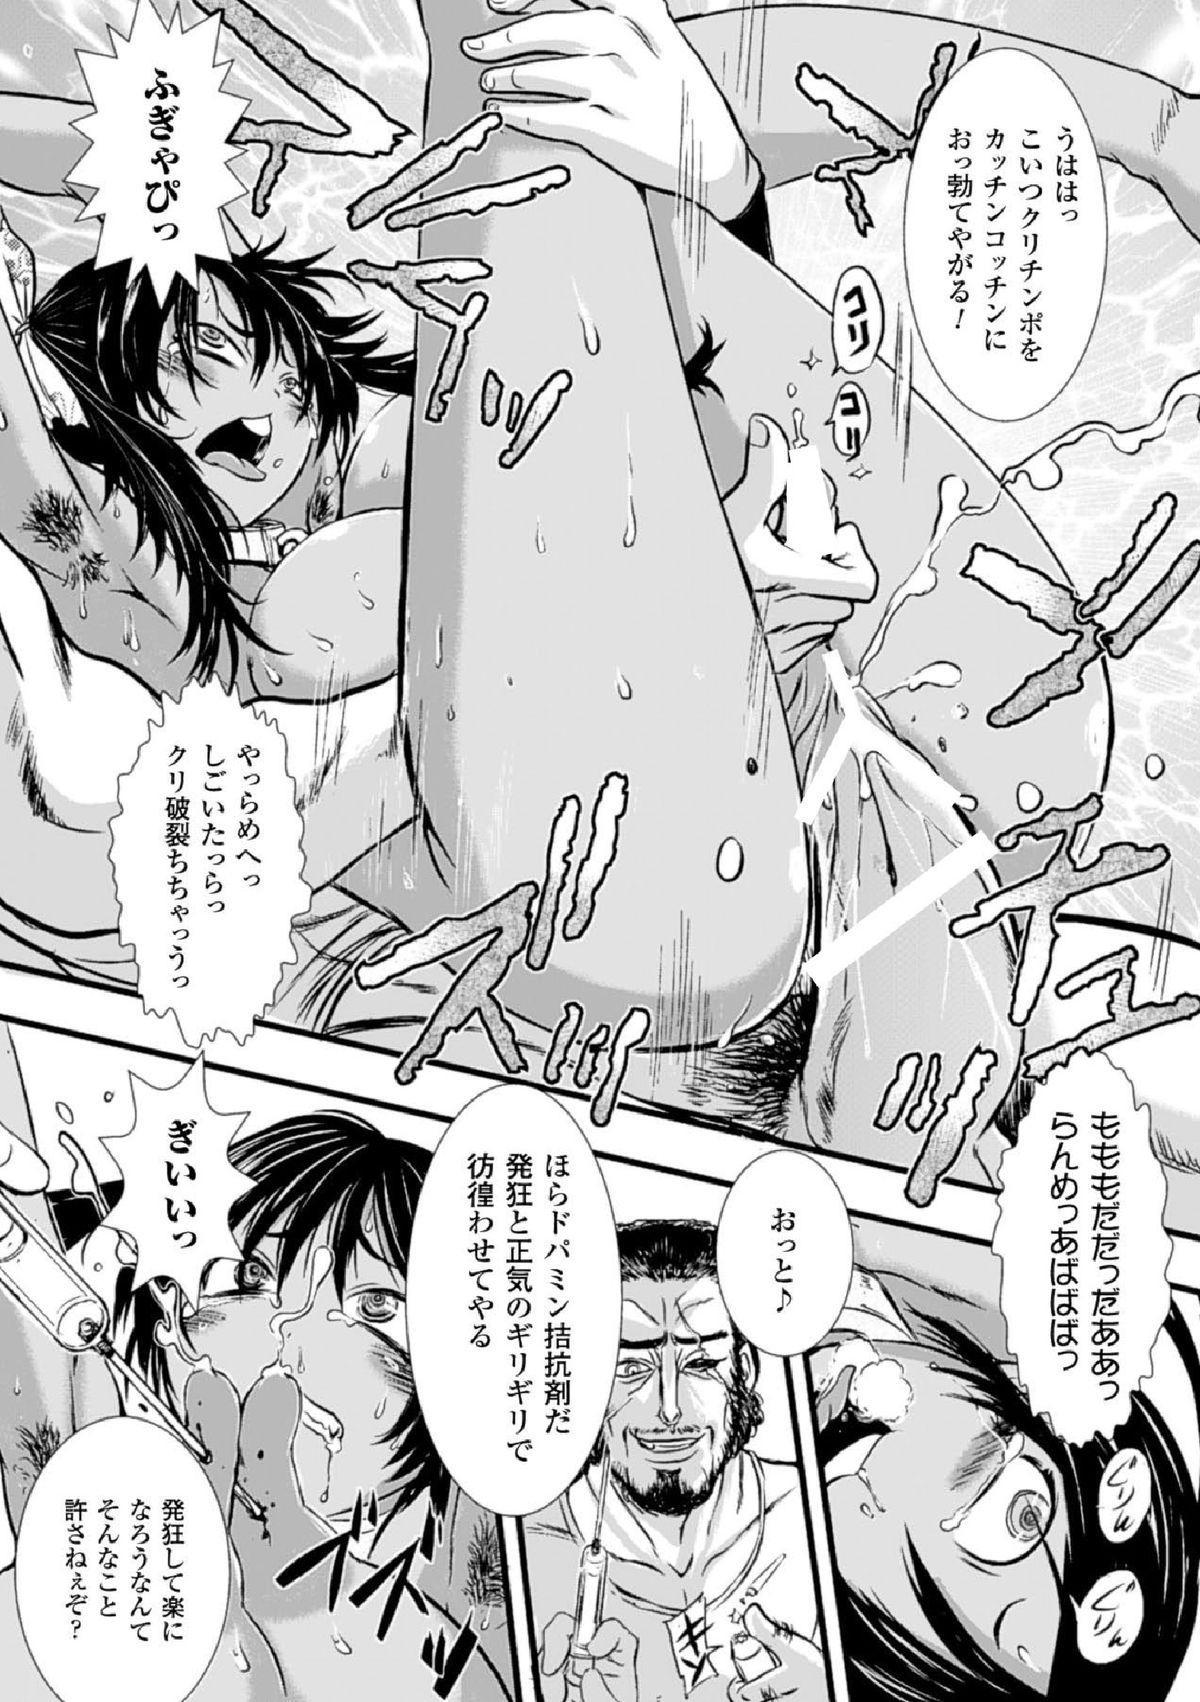 Haiboku Heroine Kaizou Choukyou Inferno 99